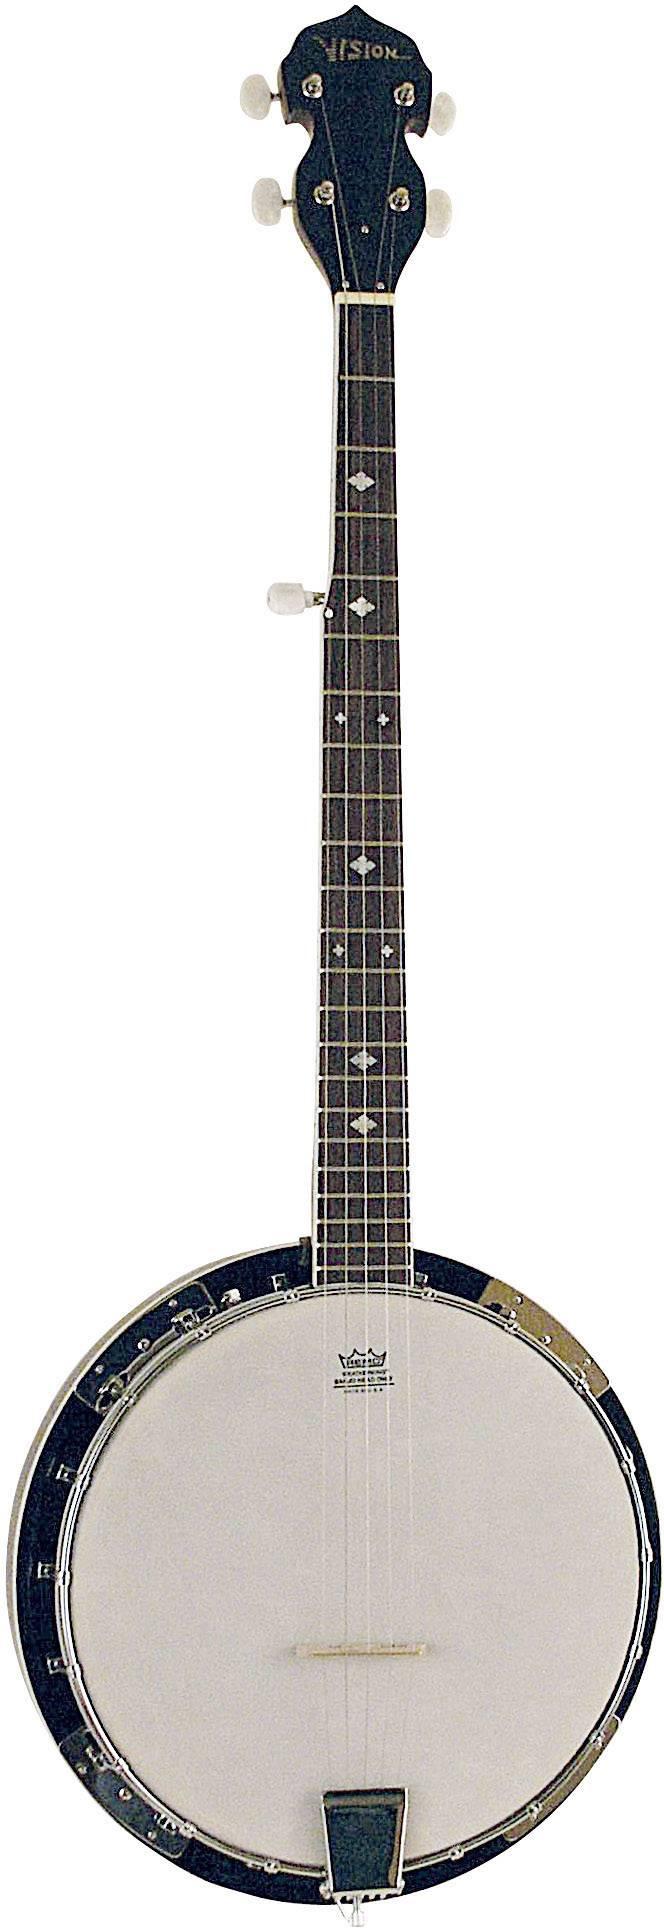 Banjo MSA Musikinstrumente BJ-5, černá/bílá